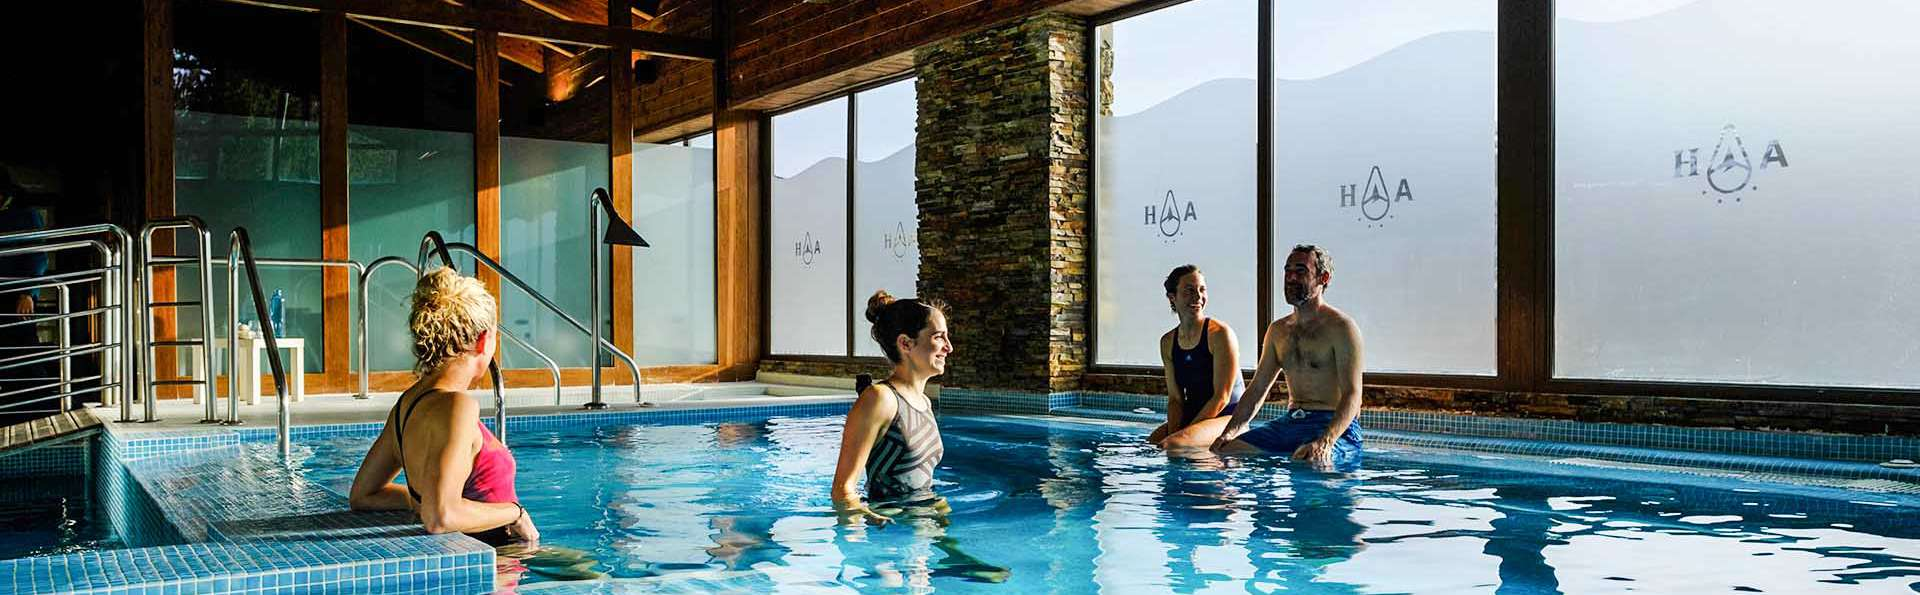 Aragon Hills Hotel & Spa - EDIT_POOL_02.jpg